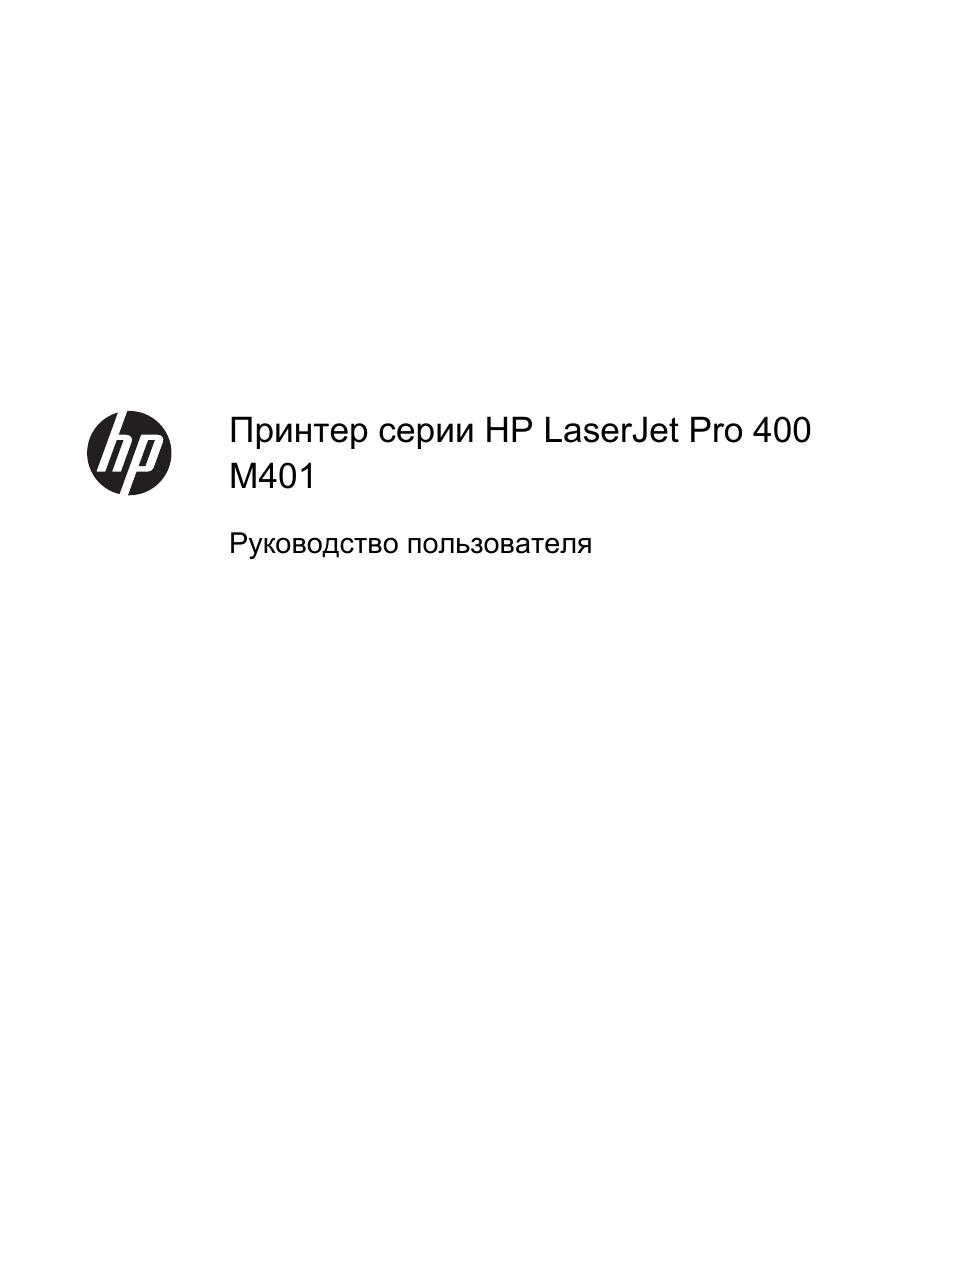 Принтер серии HP LaserJet Pro.